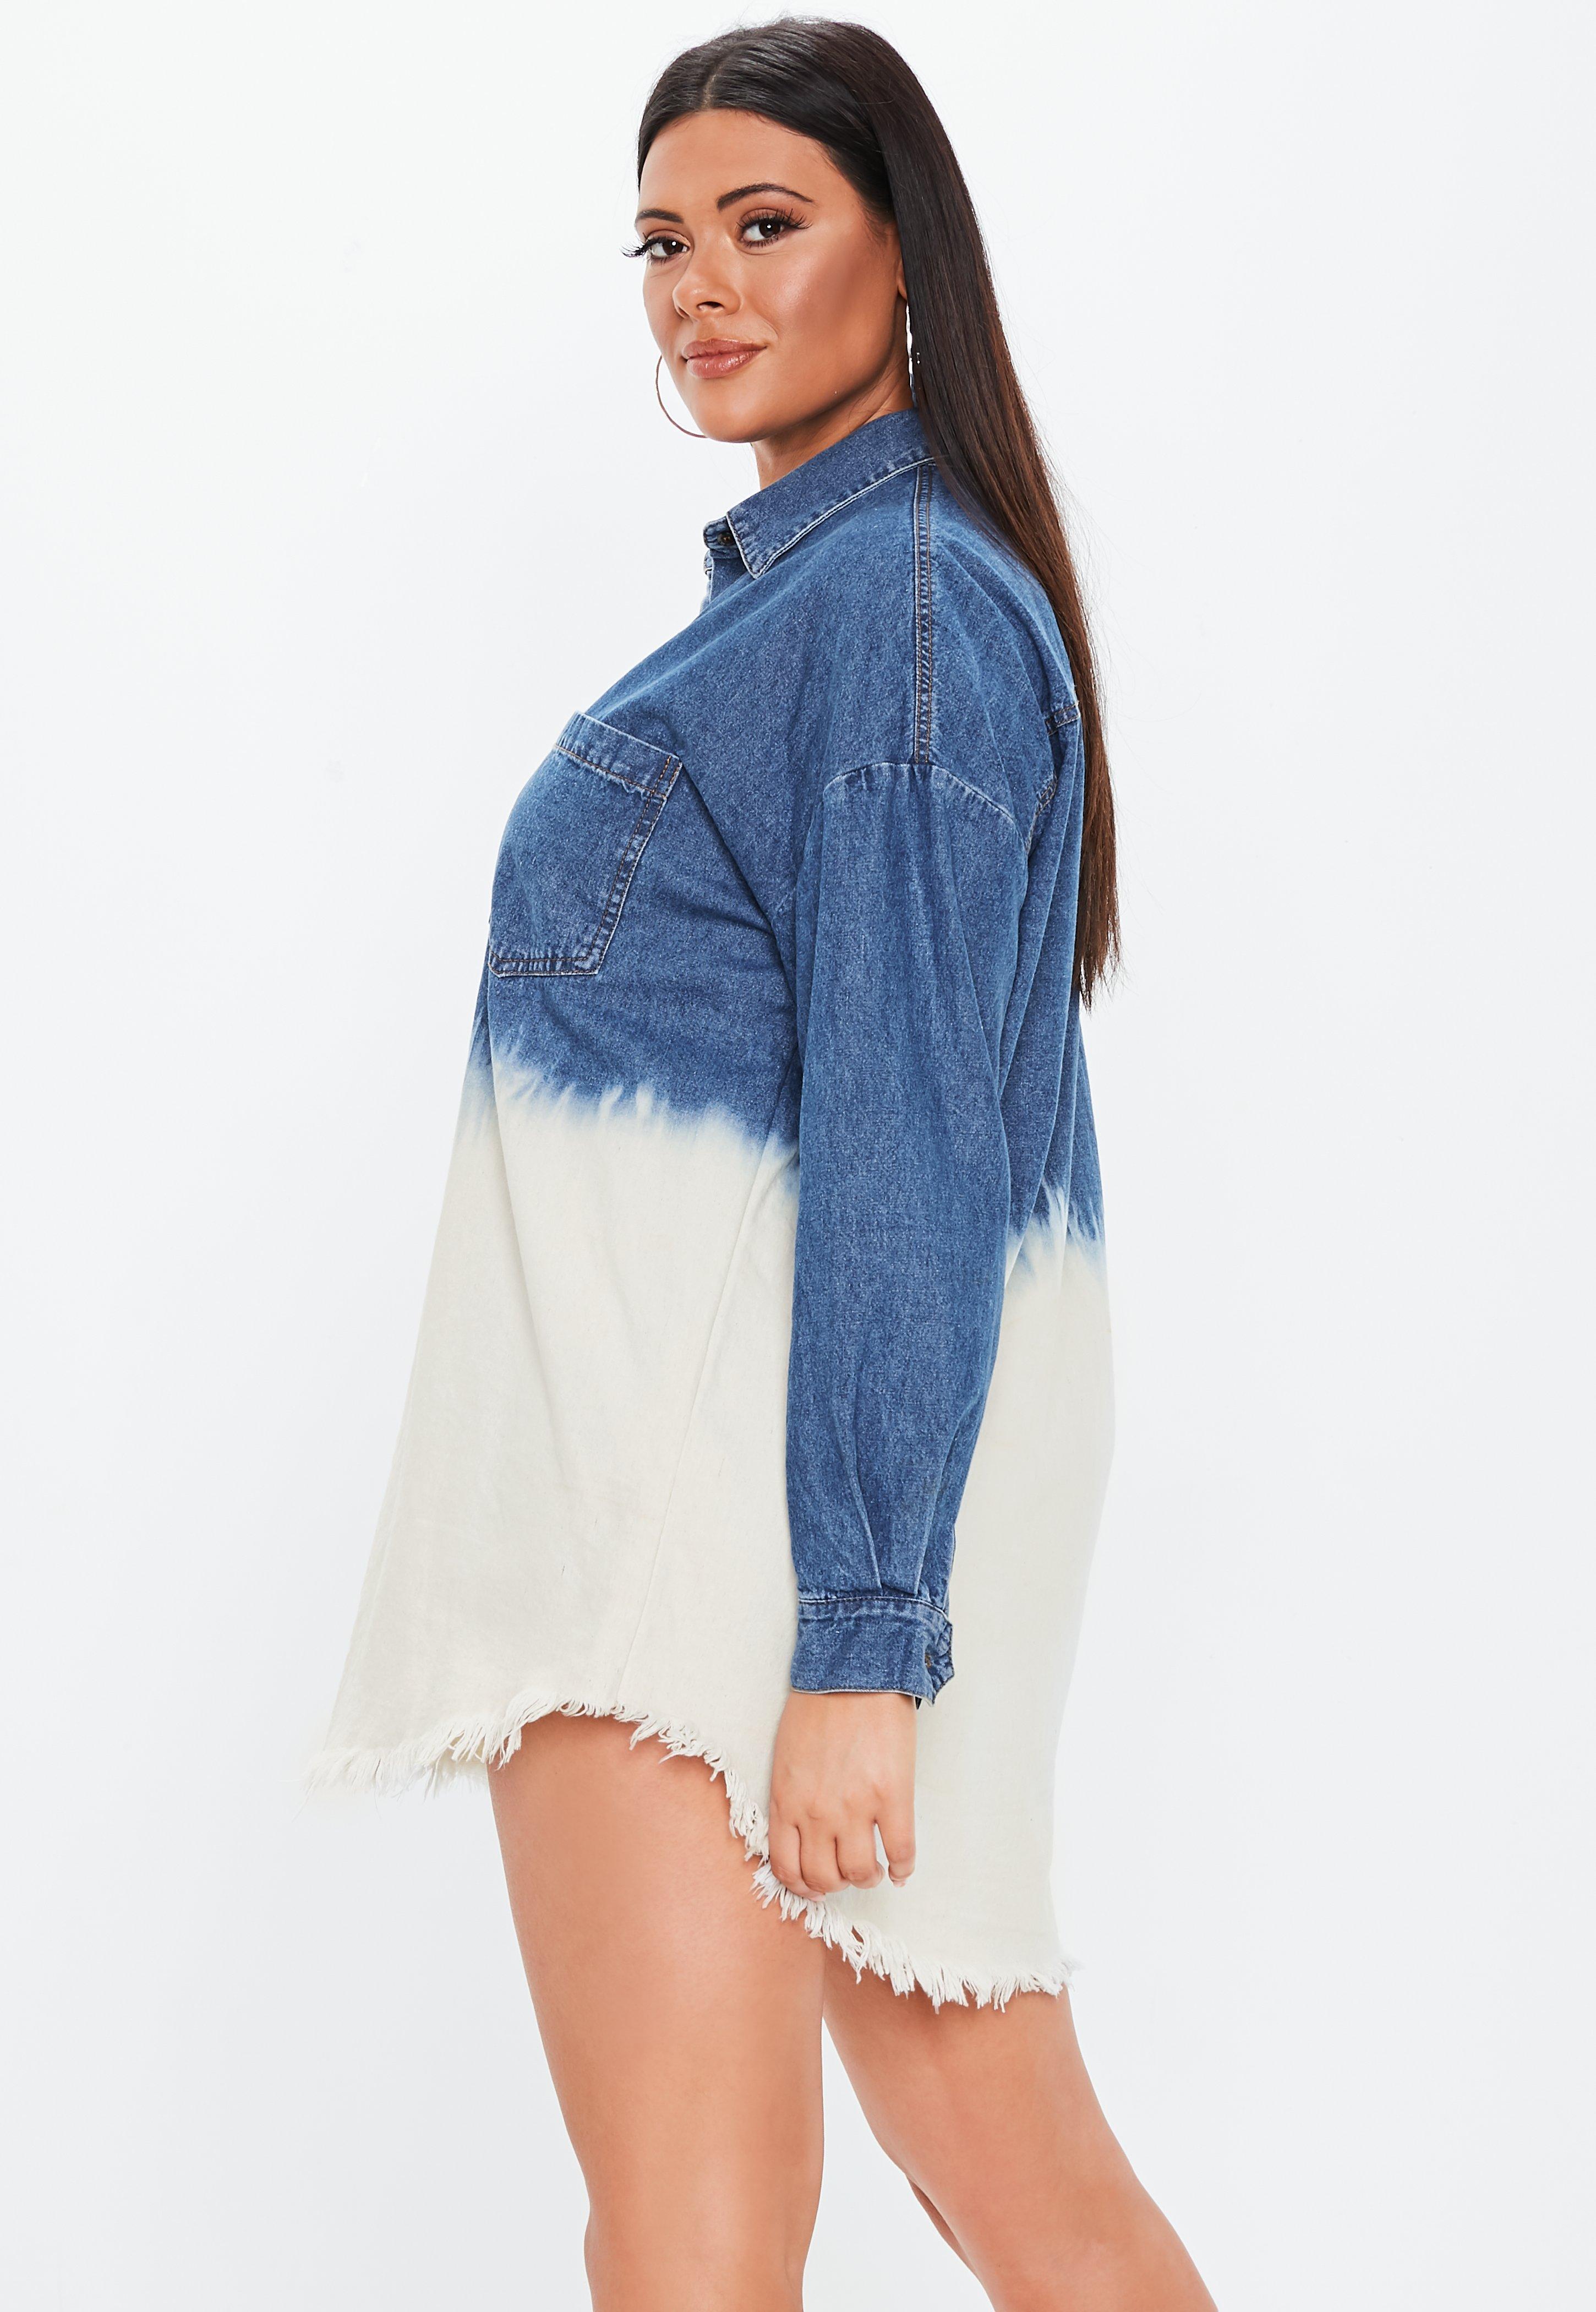 fe600a5c8595e Plus Size Denim Shirt - PostParc